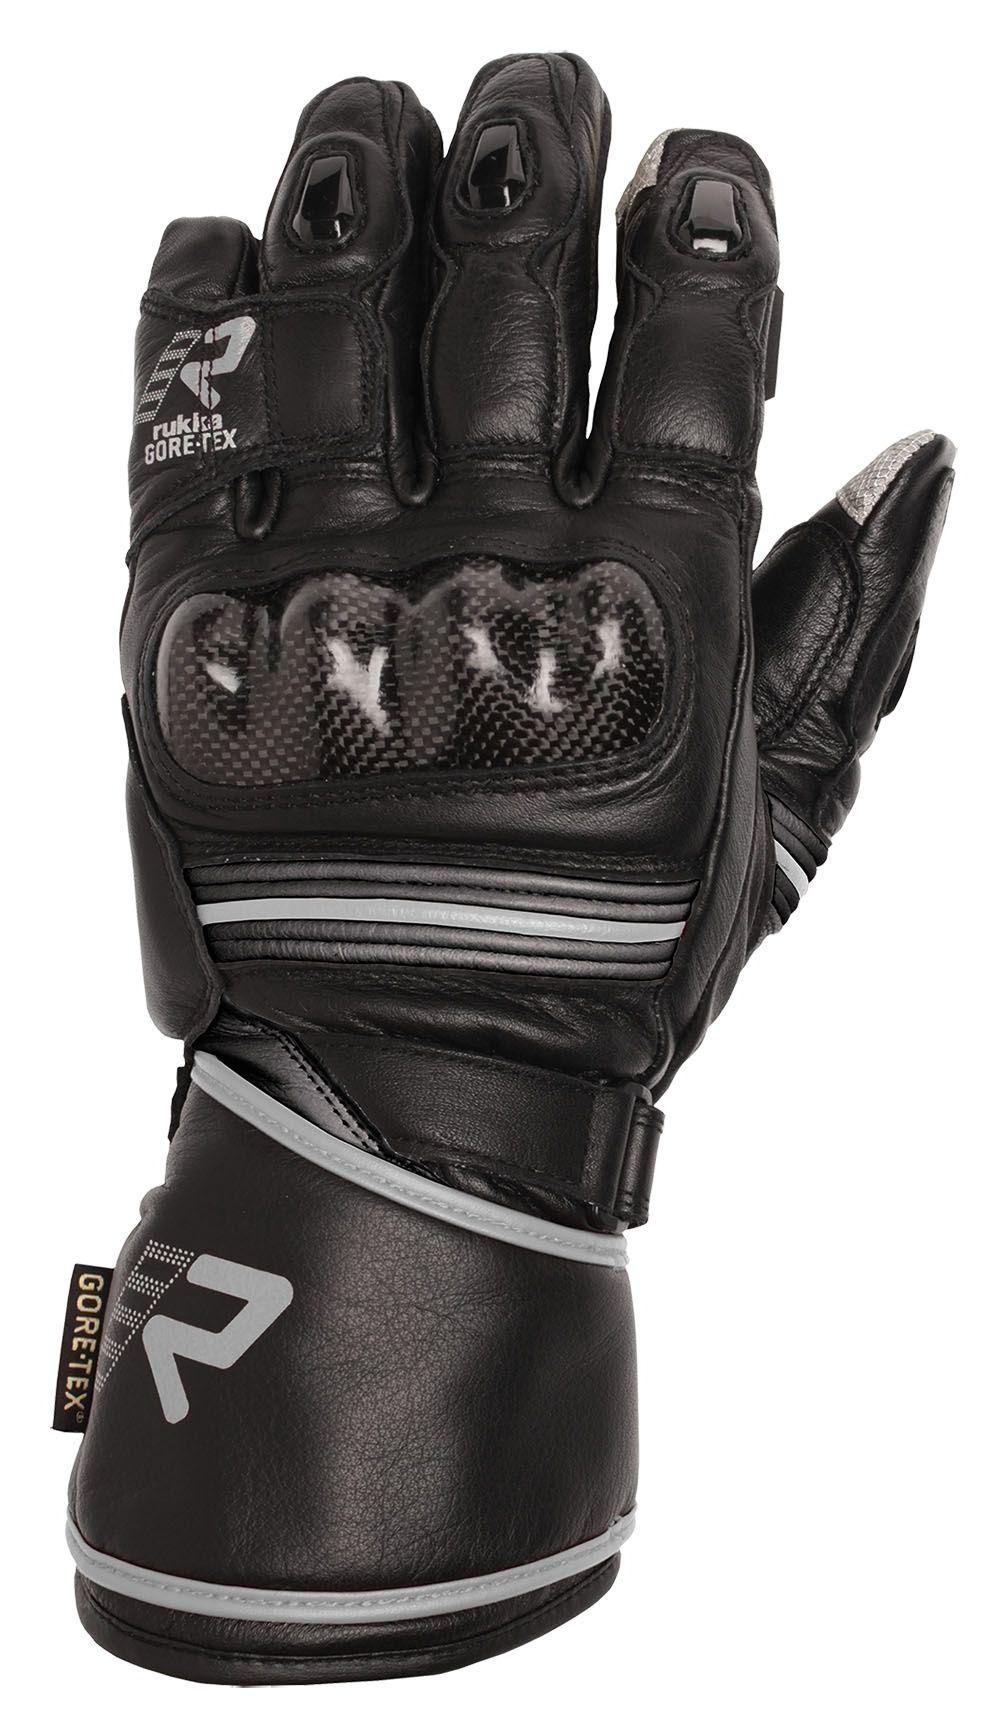 Motorcycle gloves outlast - Motorcycle Gloves Outlast 46